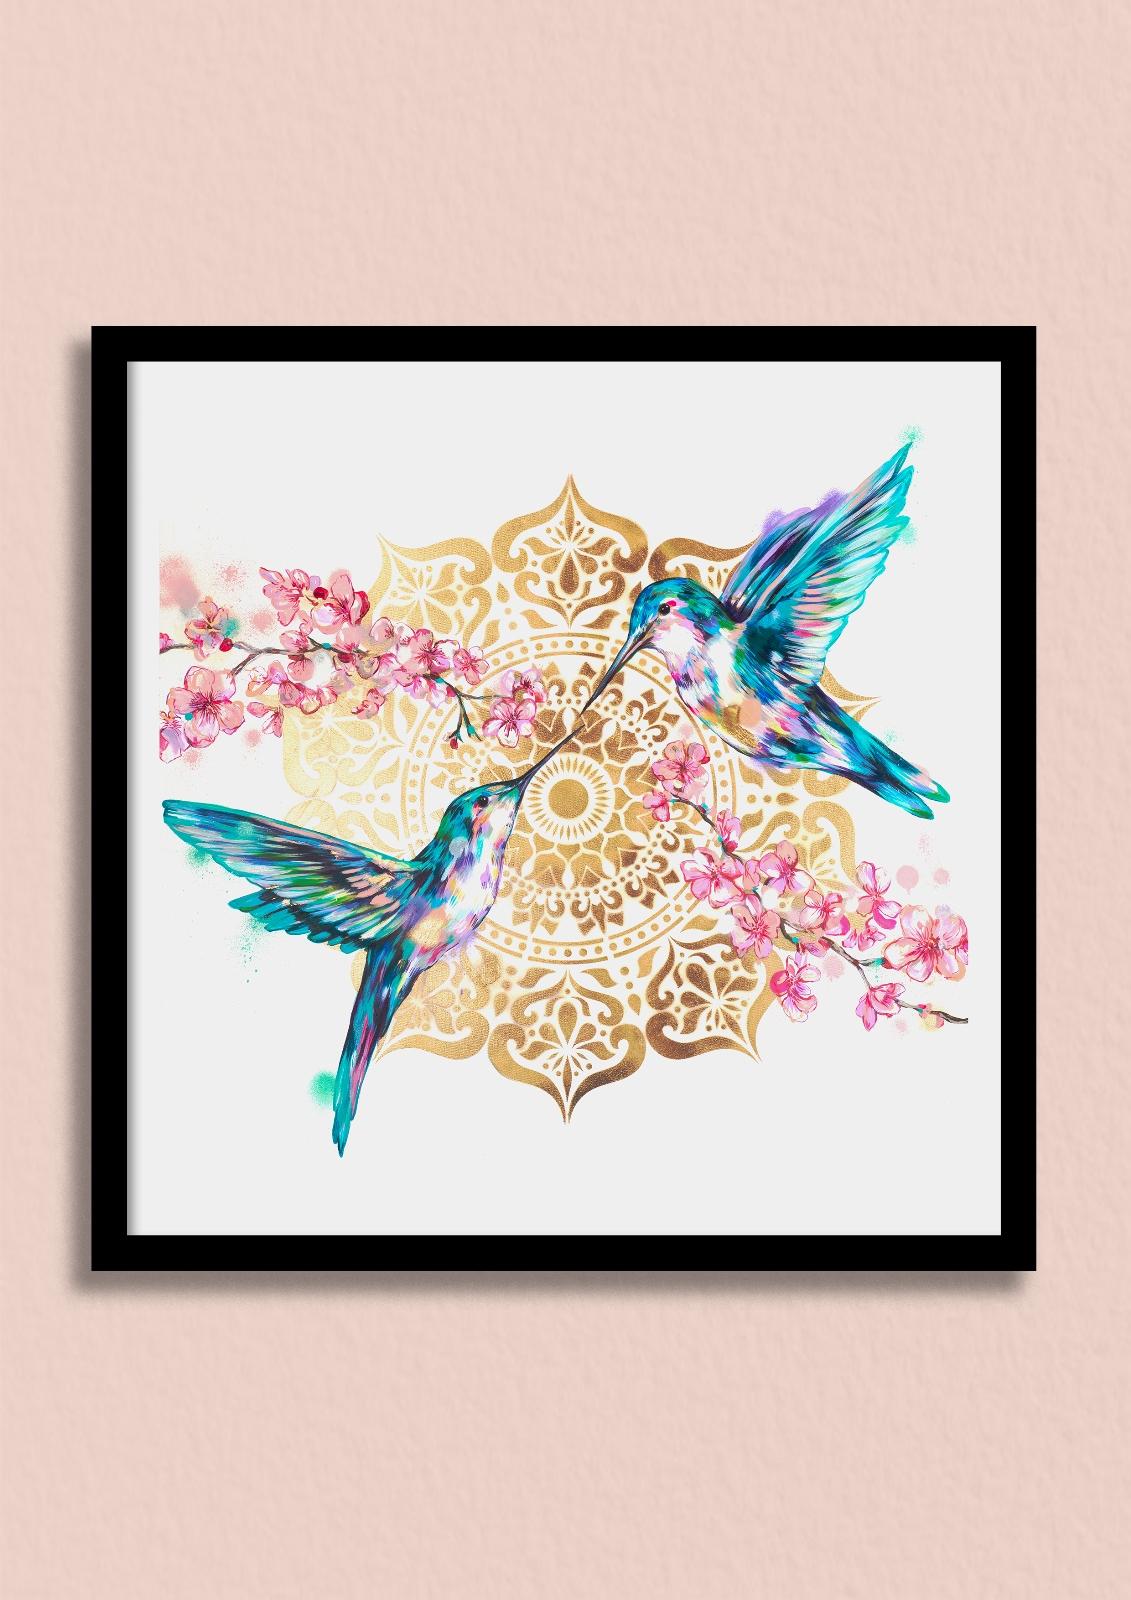 SUNLIT SAKURA - Be inspired by the sheer beauty and symbolism of hummingbirds and Japanese sakura blossoms.Unframed giclée print £150Framed giclée print £220